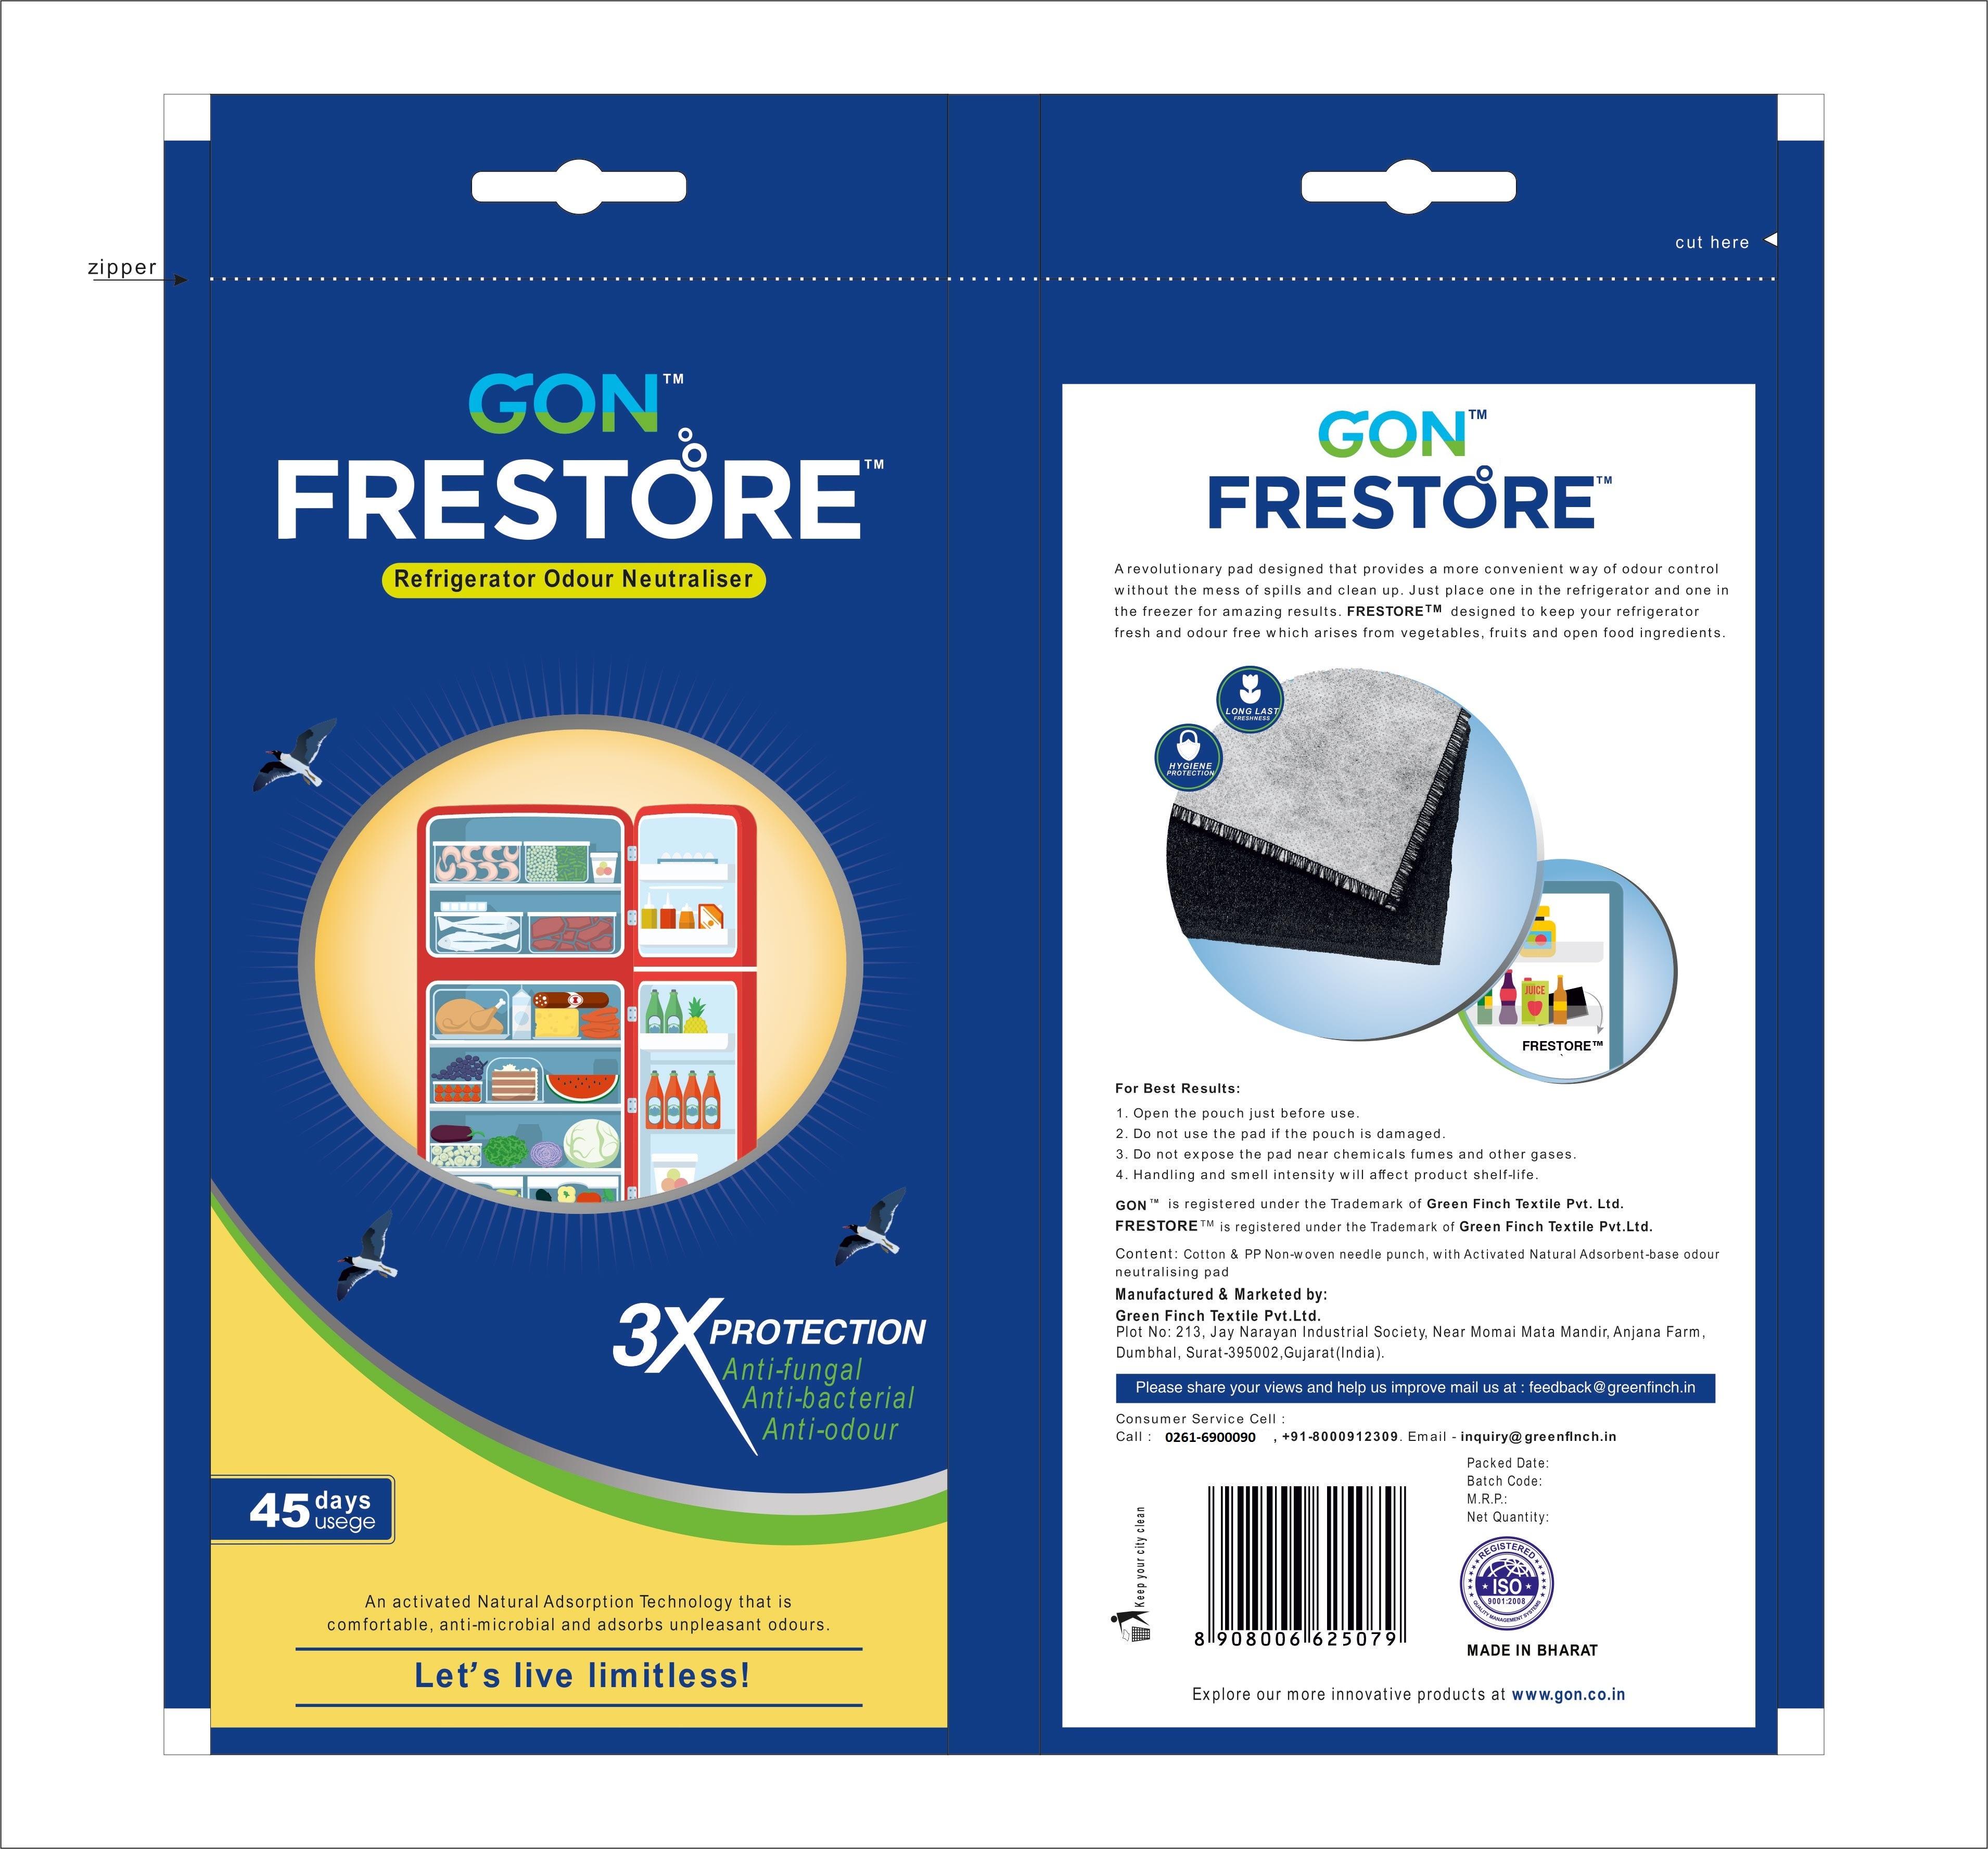 Frestore2